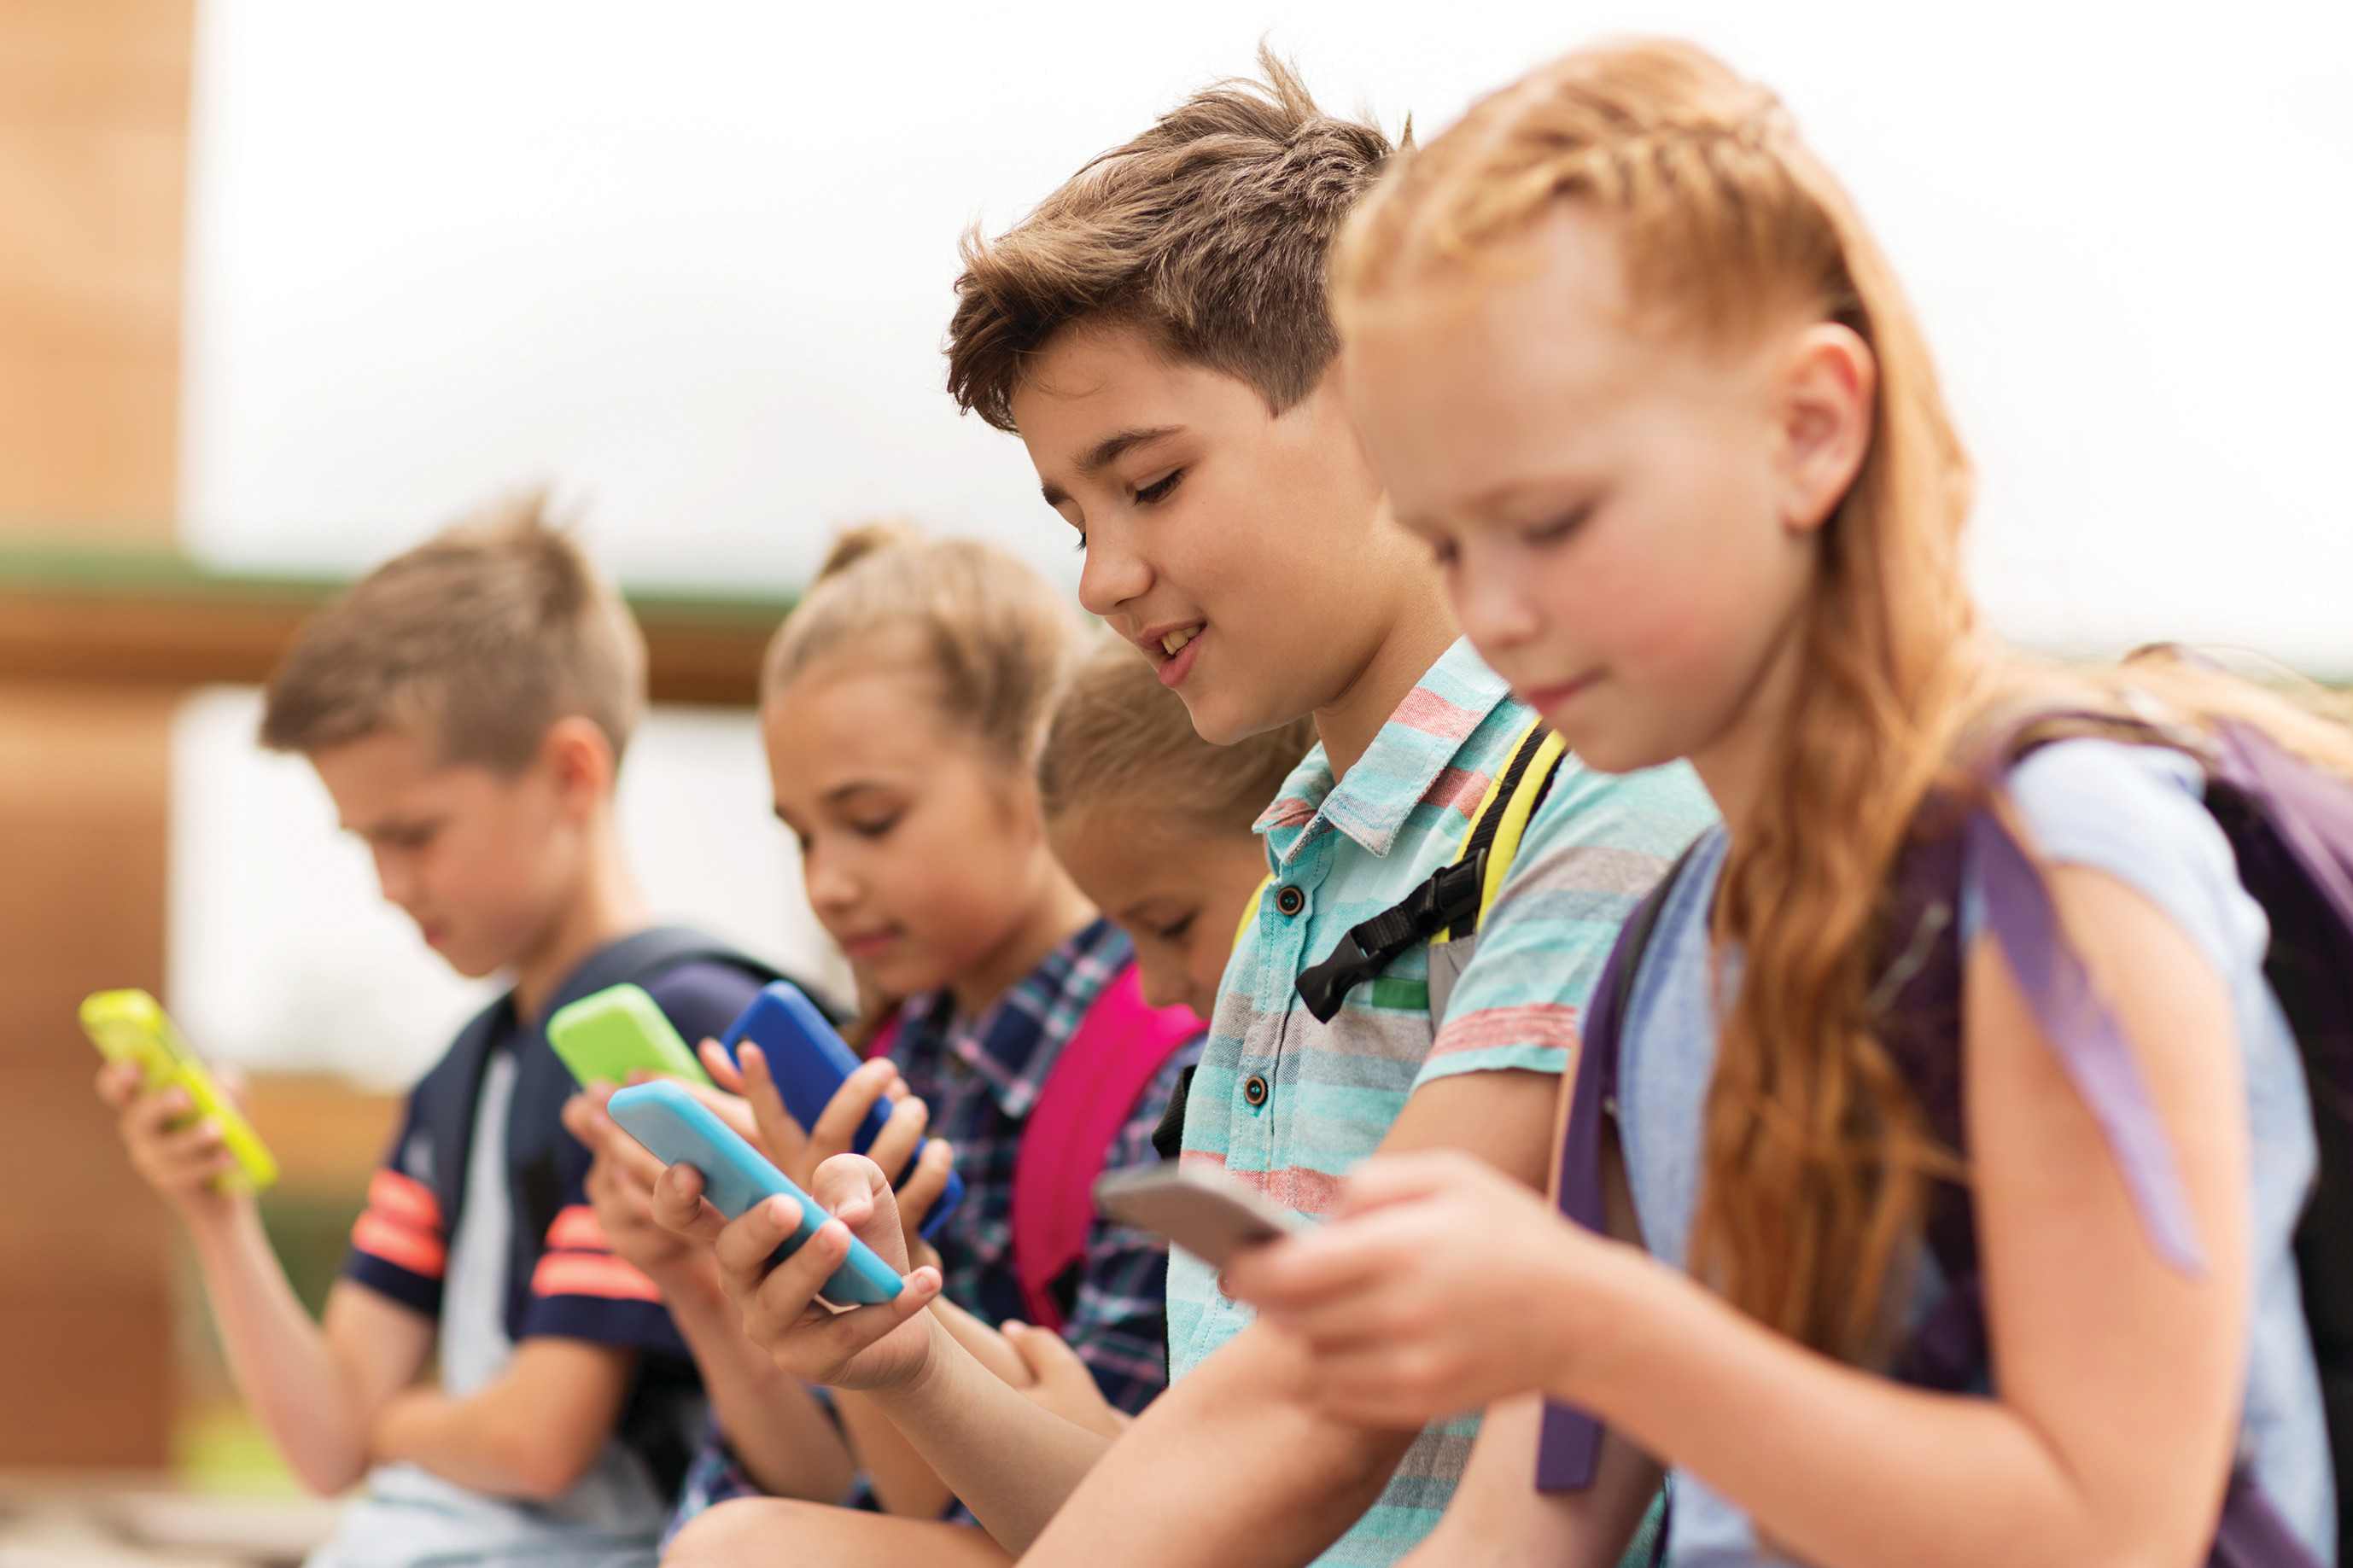 ילדים עם סמארטפון, אילוסטרציה. צילום: אינג אימג'